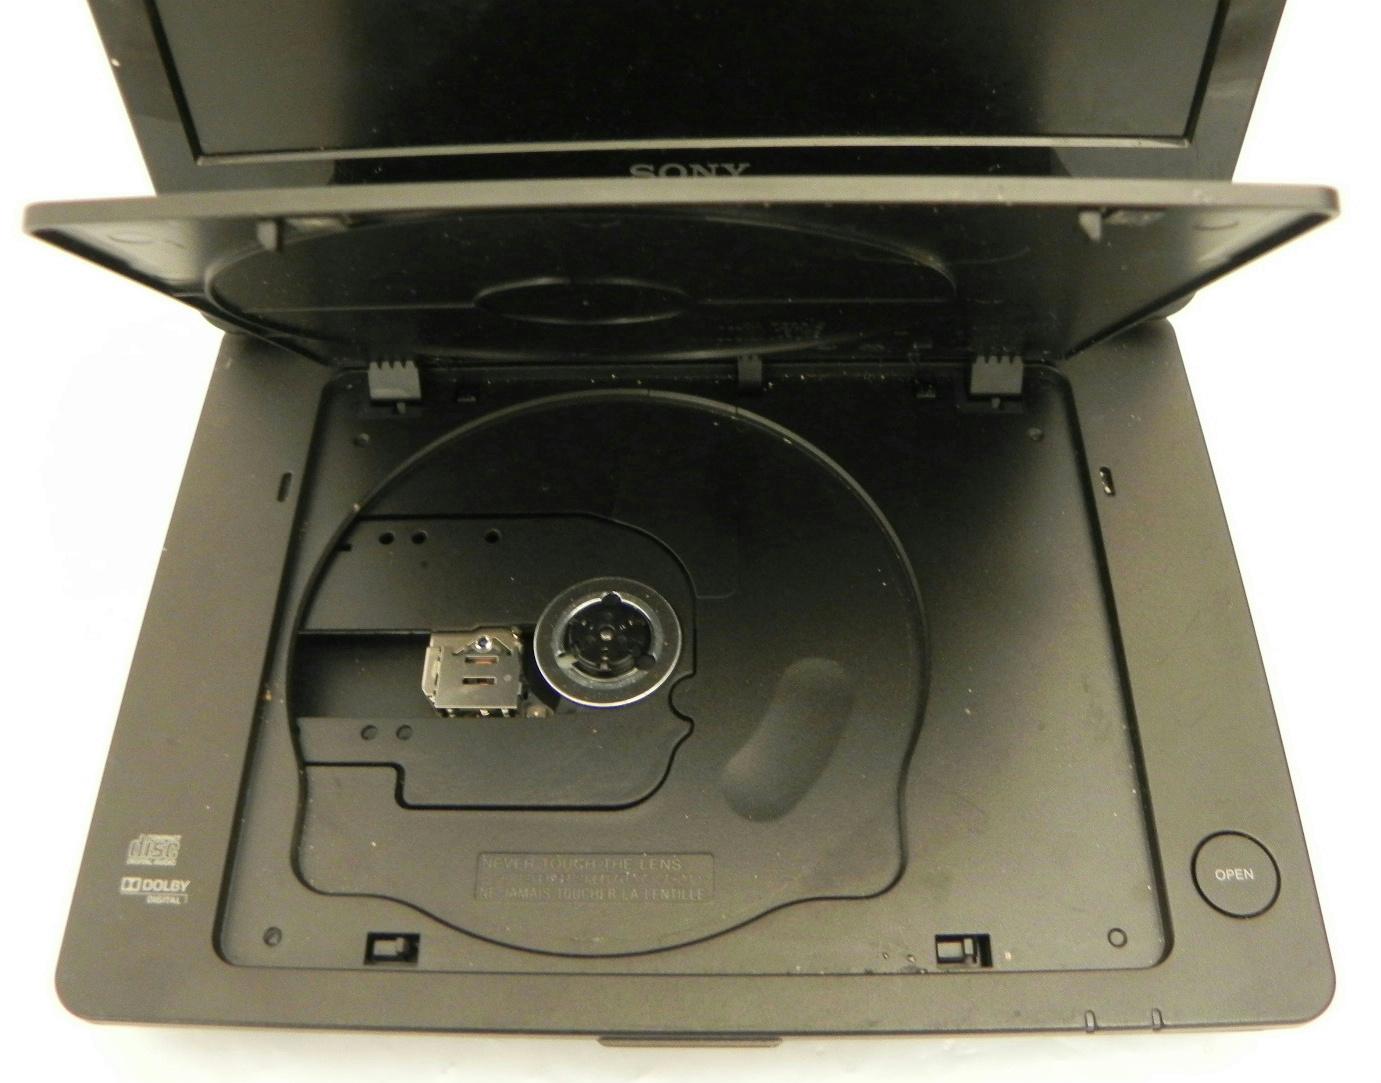 Dvp Closure Gallery: SONY Portable CD / DVD Player DVP-FX950 9 Inch Swivel